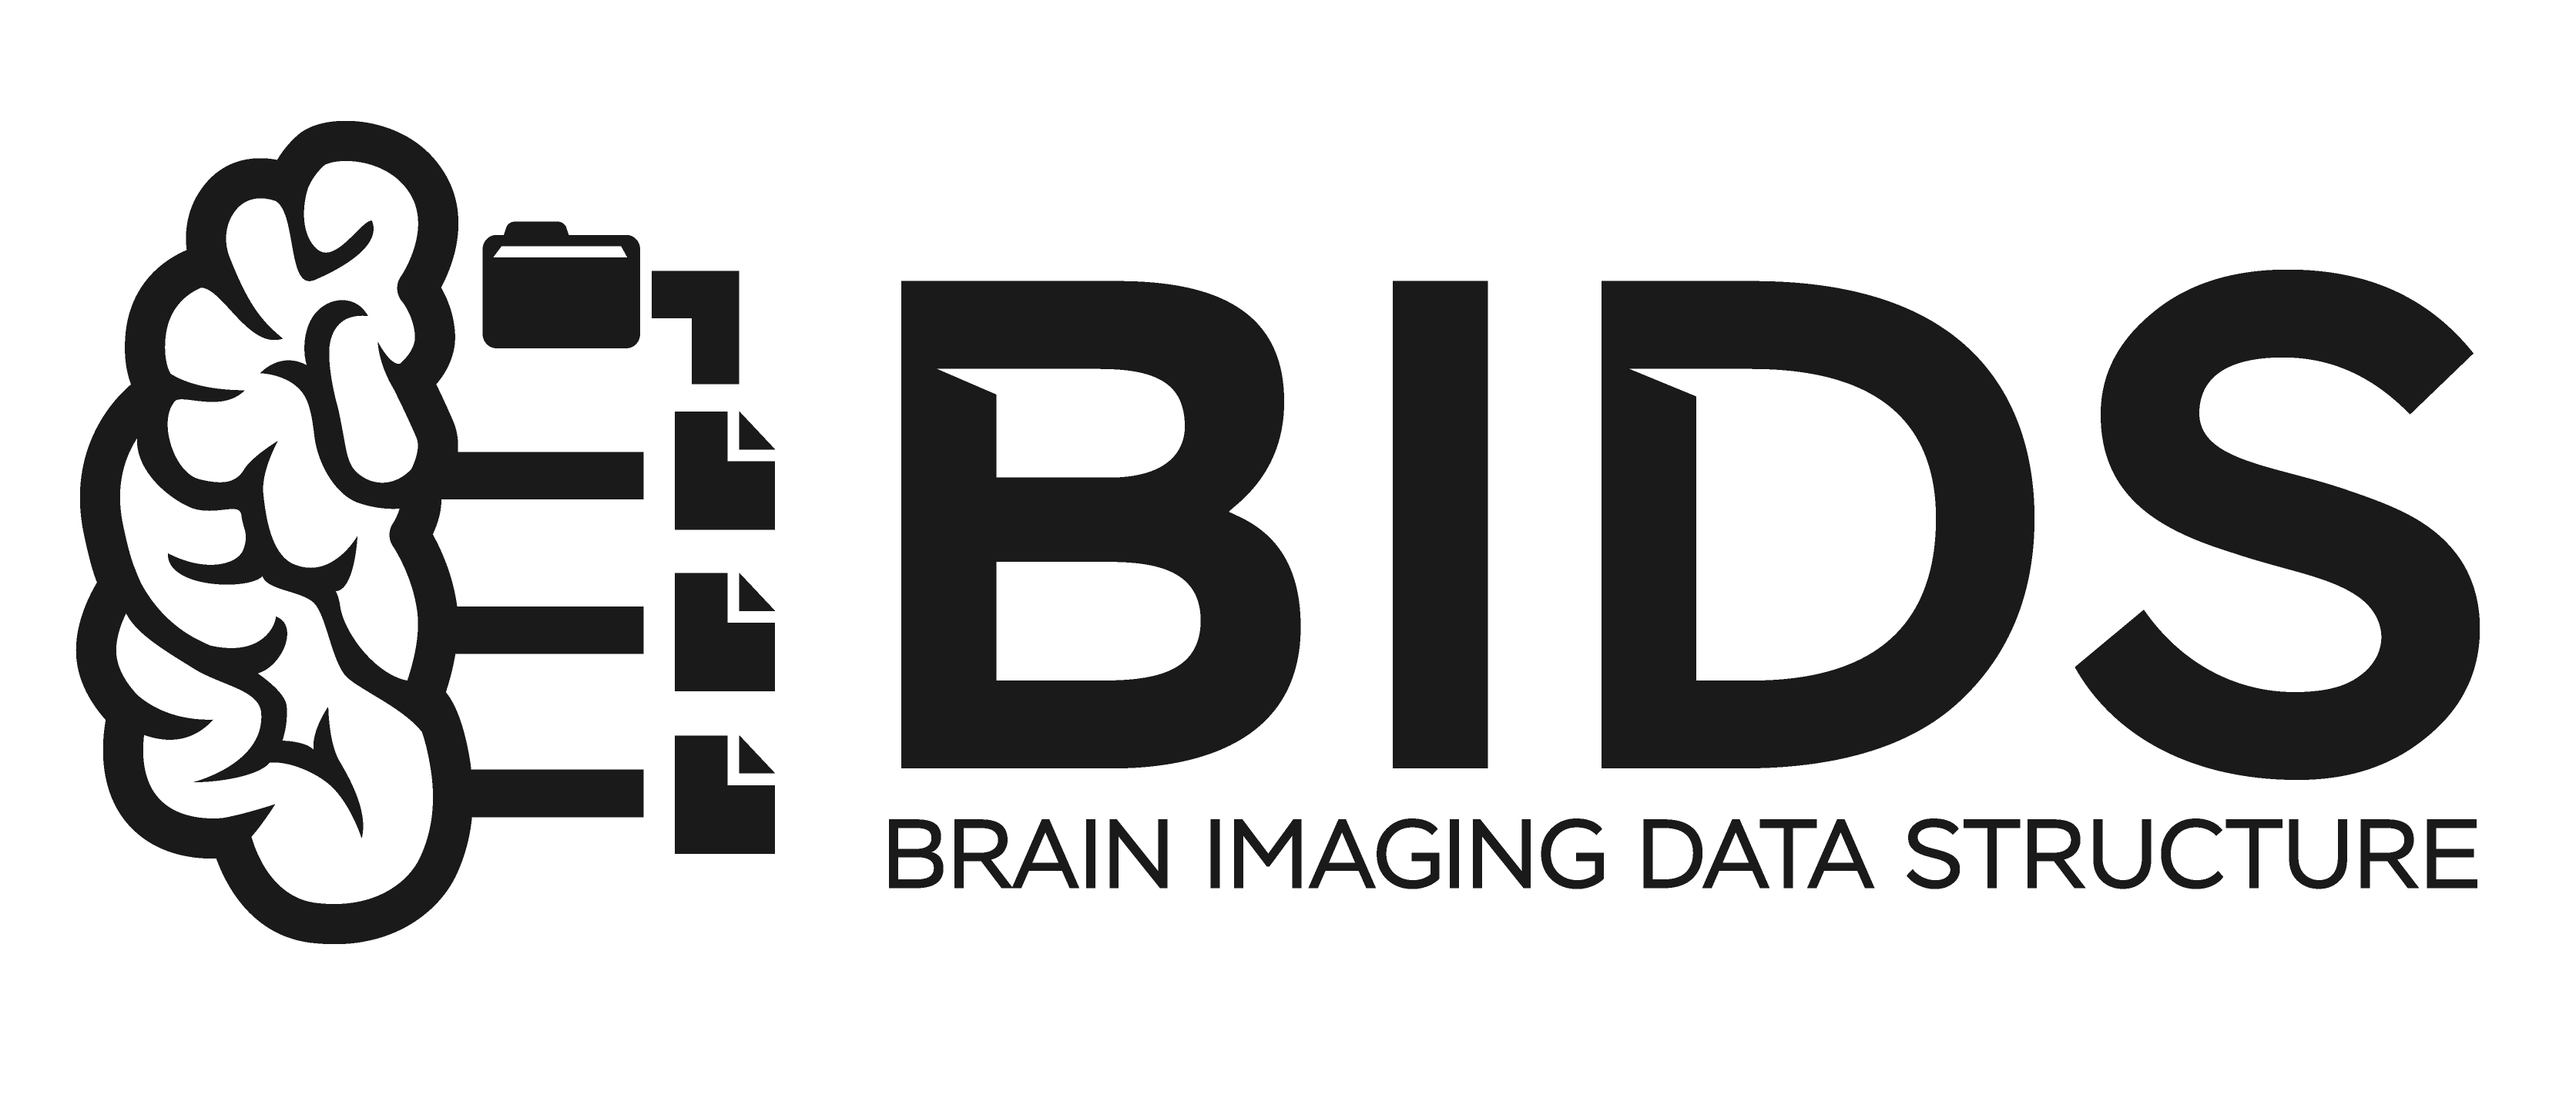 https://upload.wikimedia.org/wikipedia/commons/d/de/BIDS_Logo.png